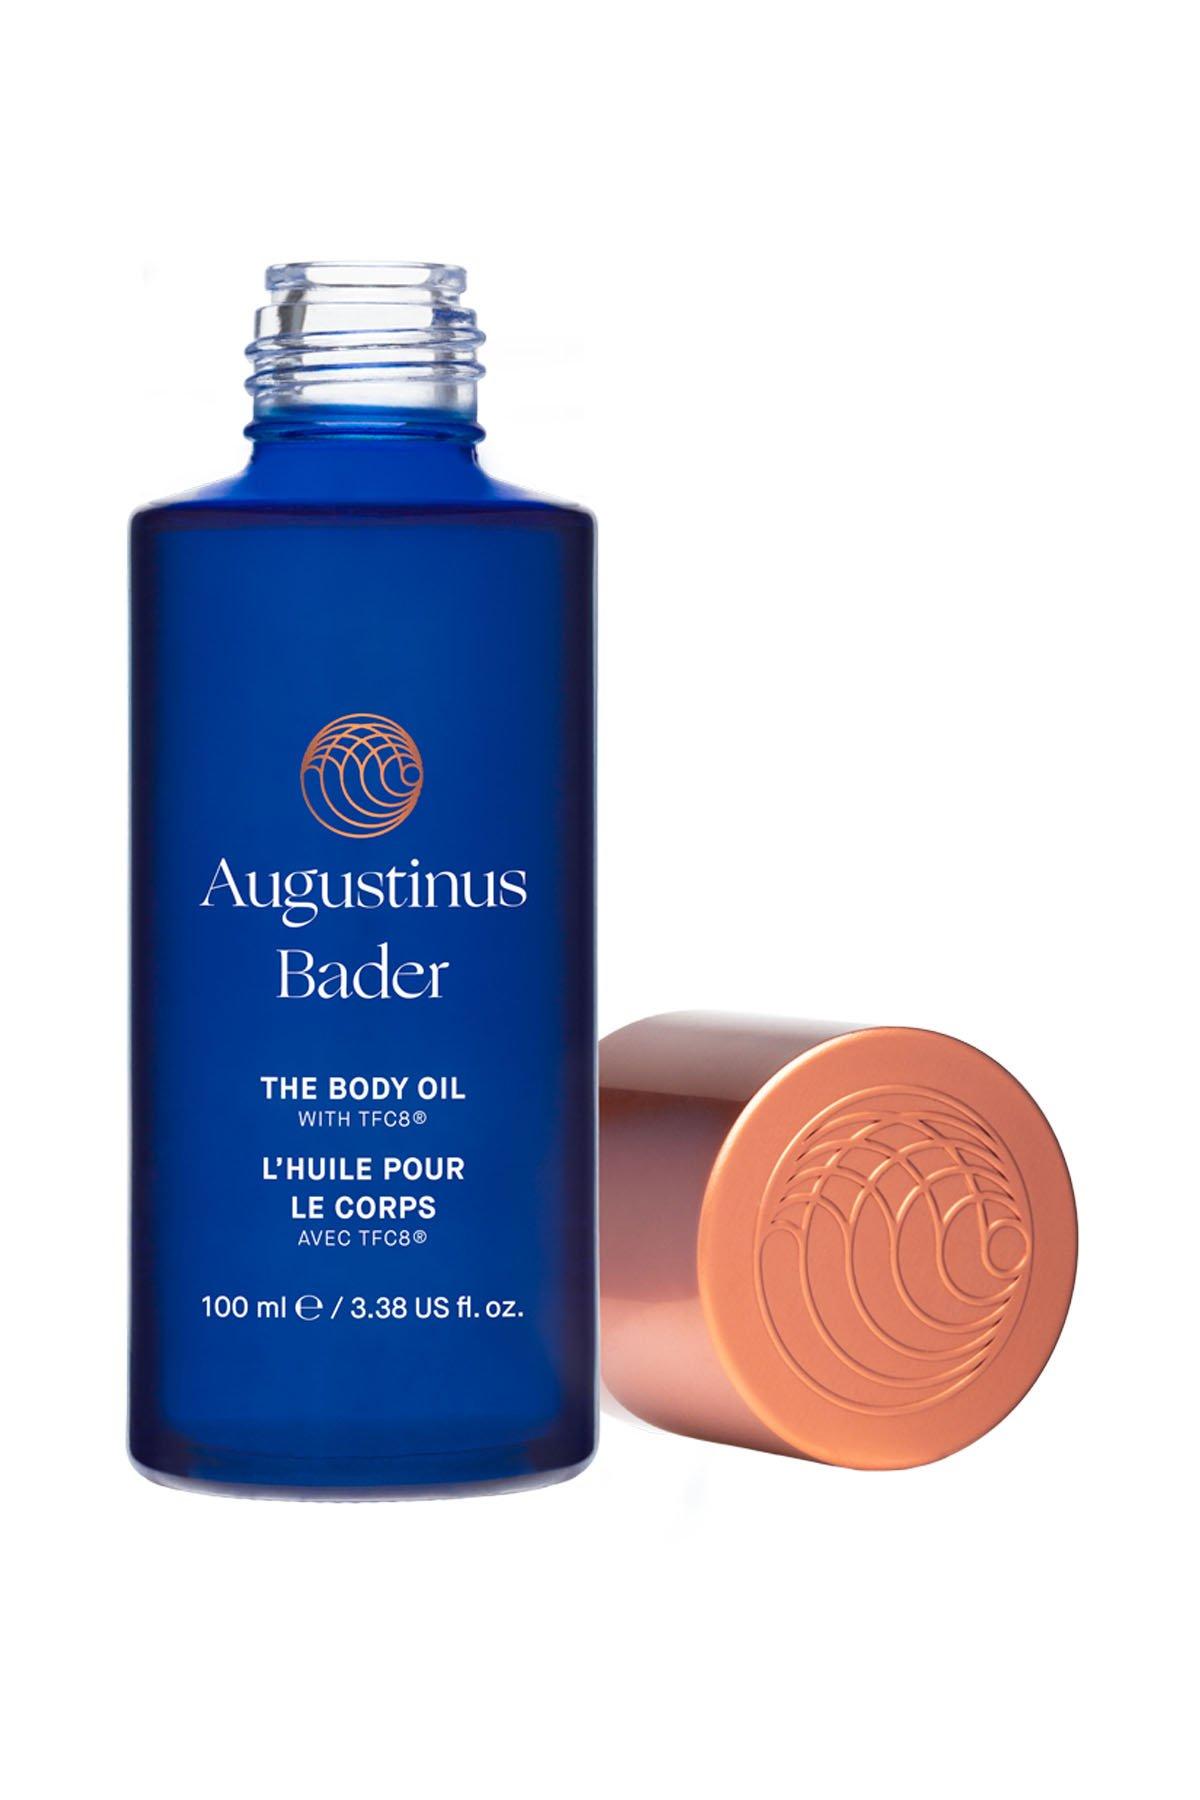 Augustinus bader the body oil 100ml